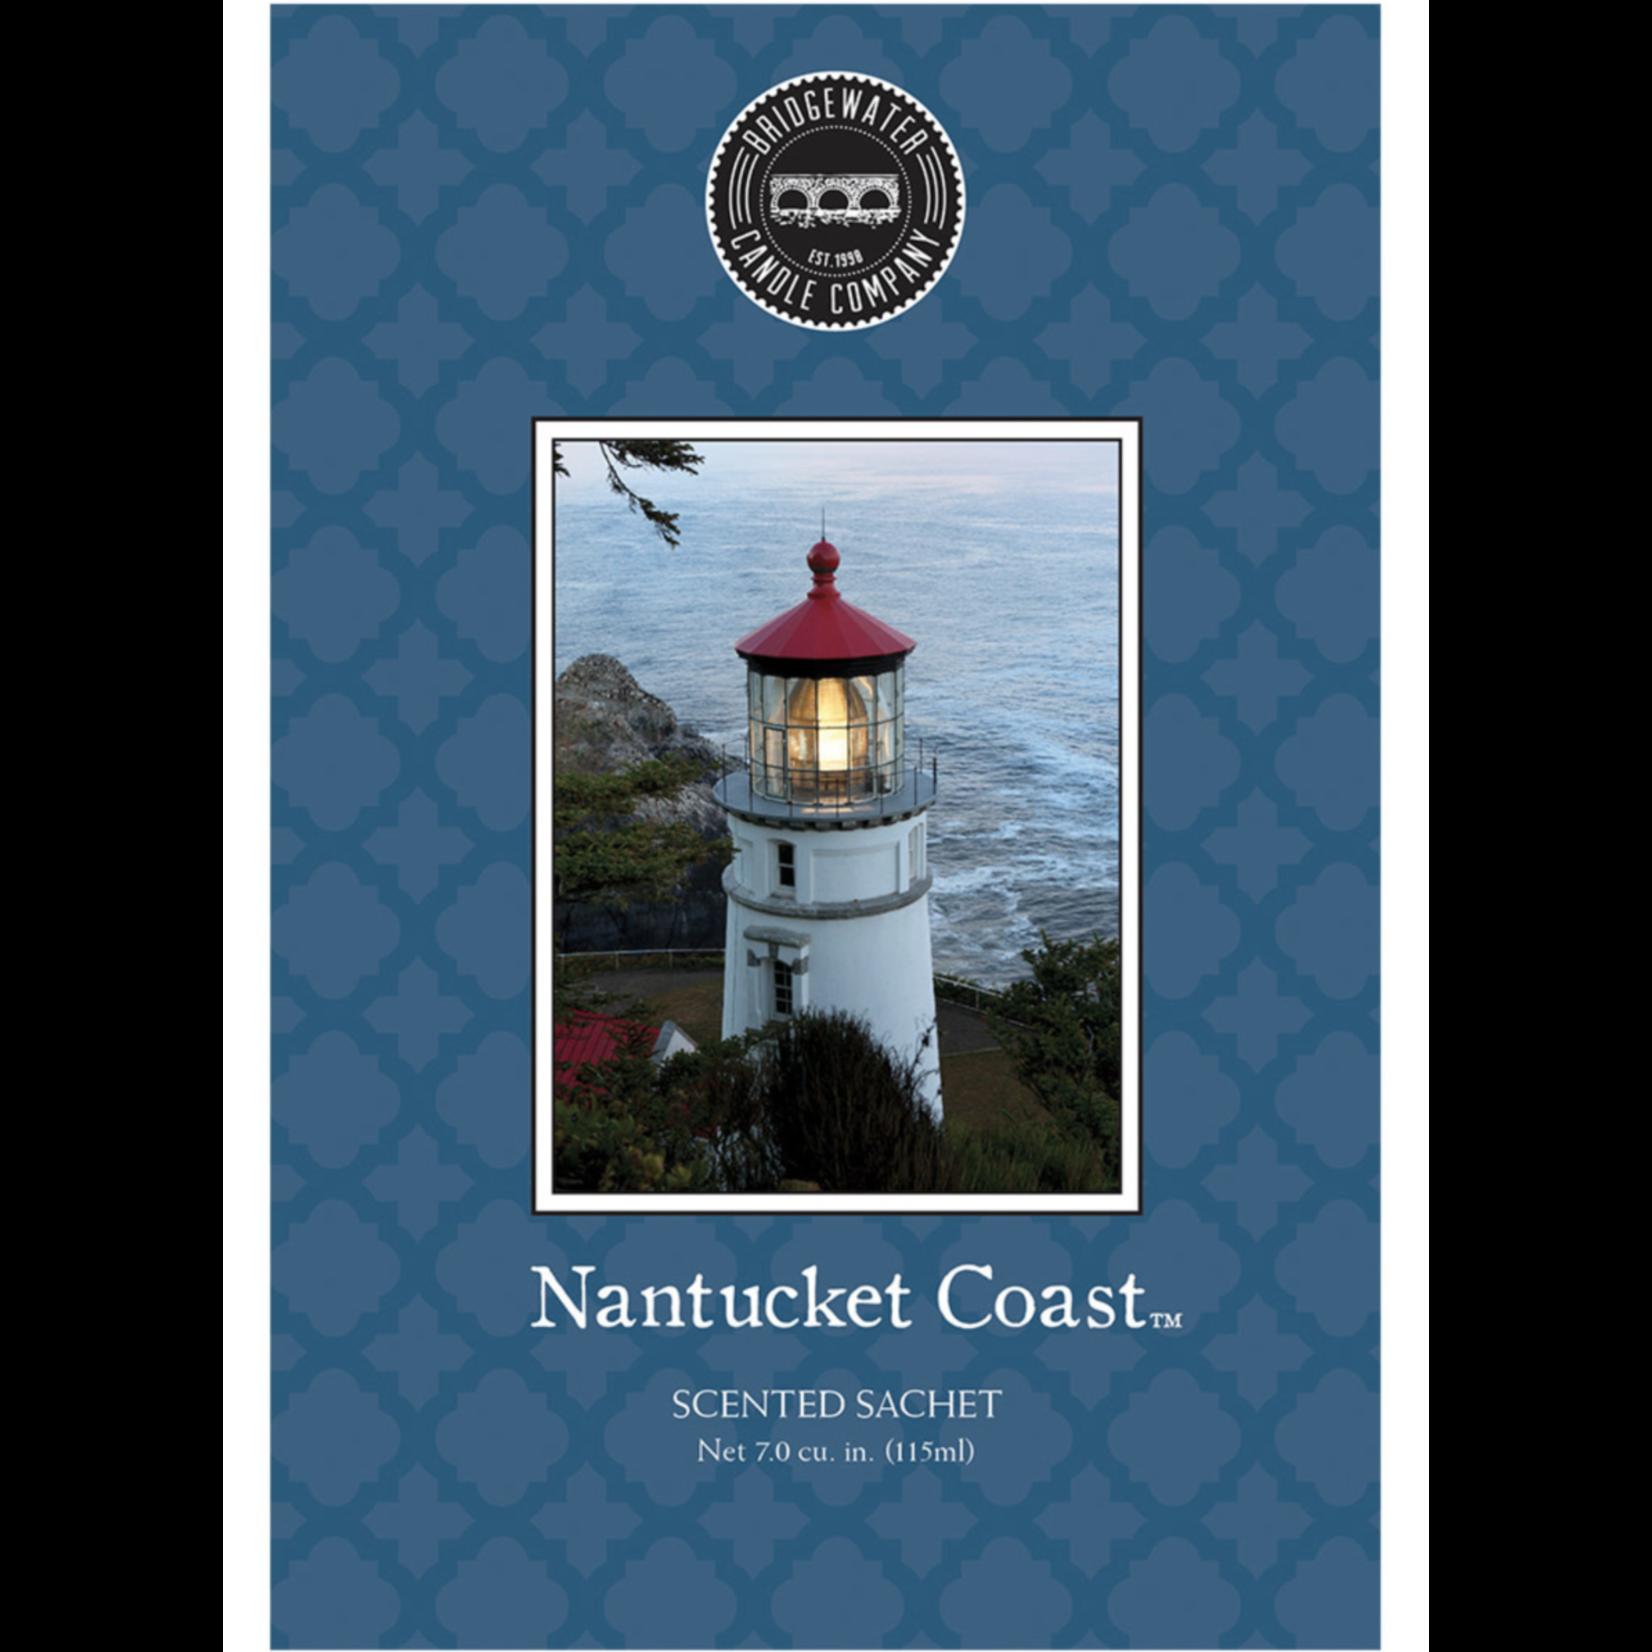 Bridgewater Scented Sachet / Geurzakje Nantucket Coast